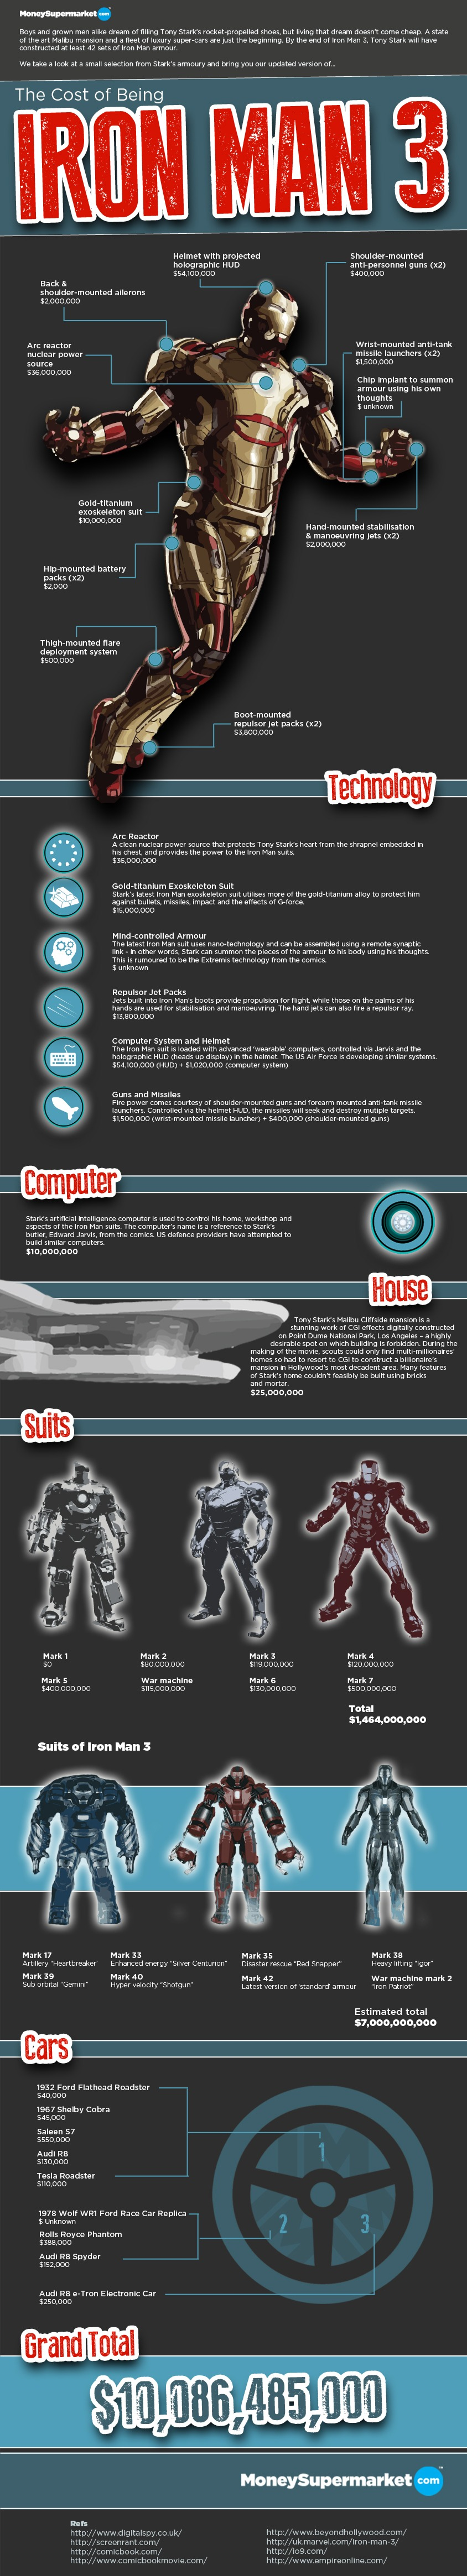 Kosten Iron Man 3